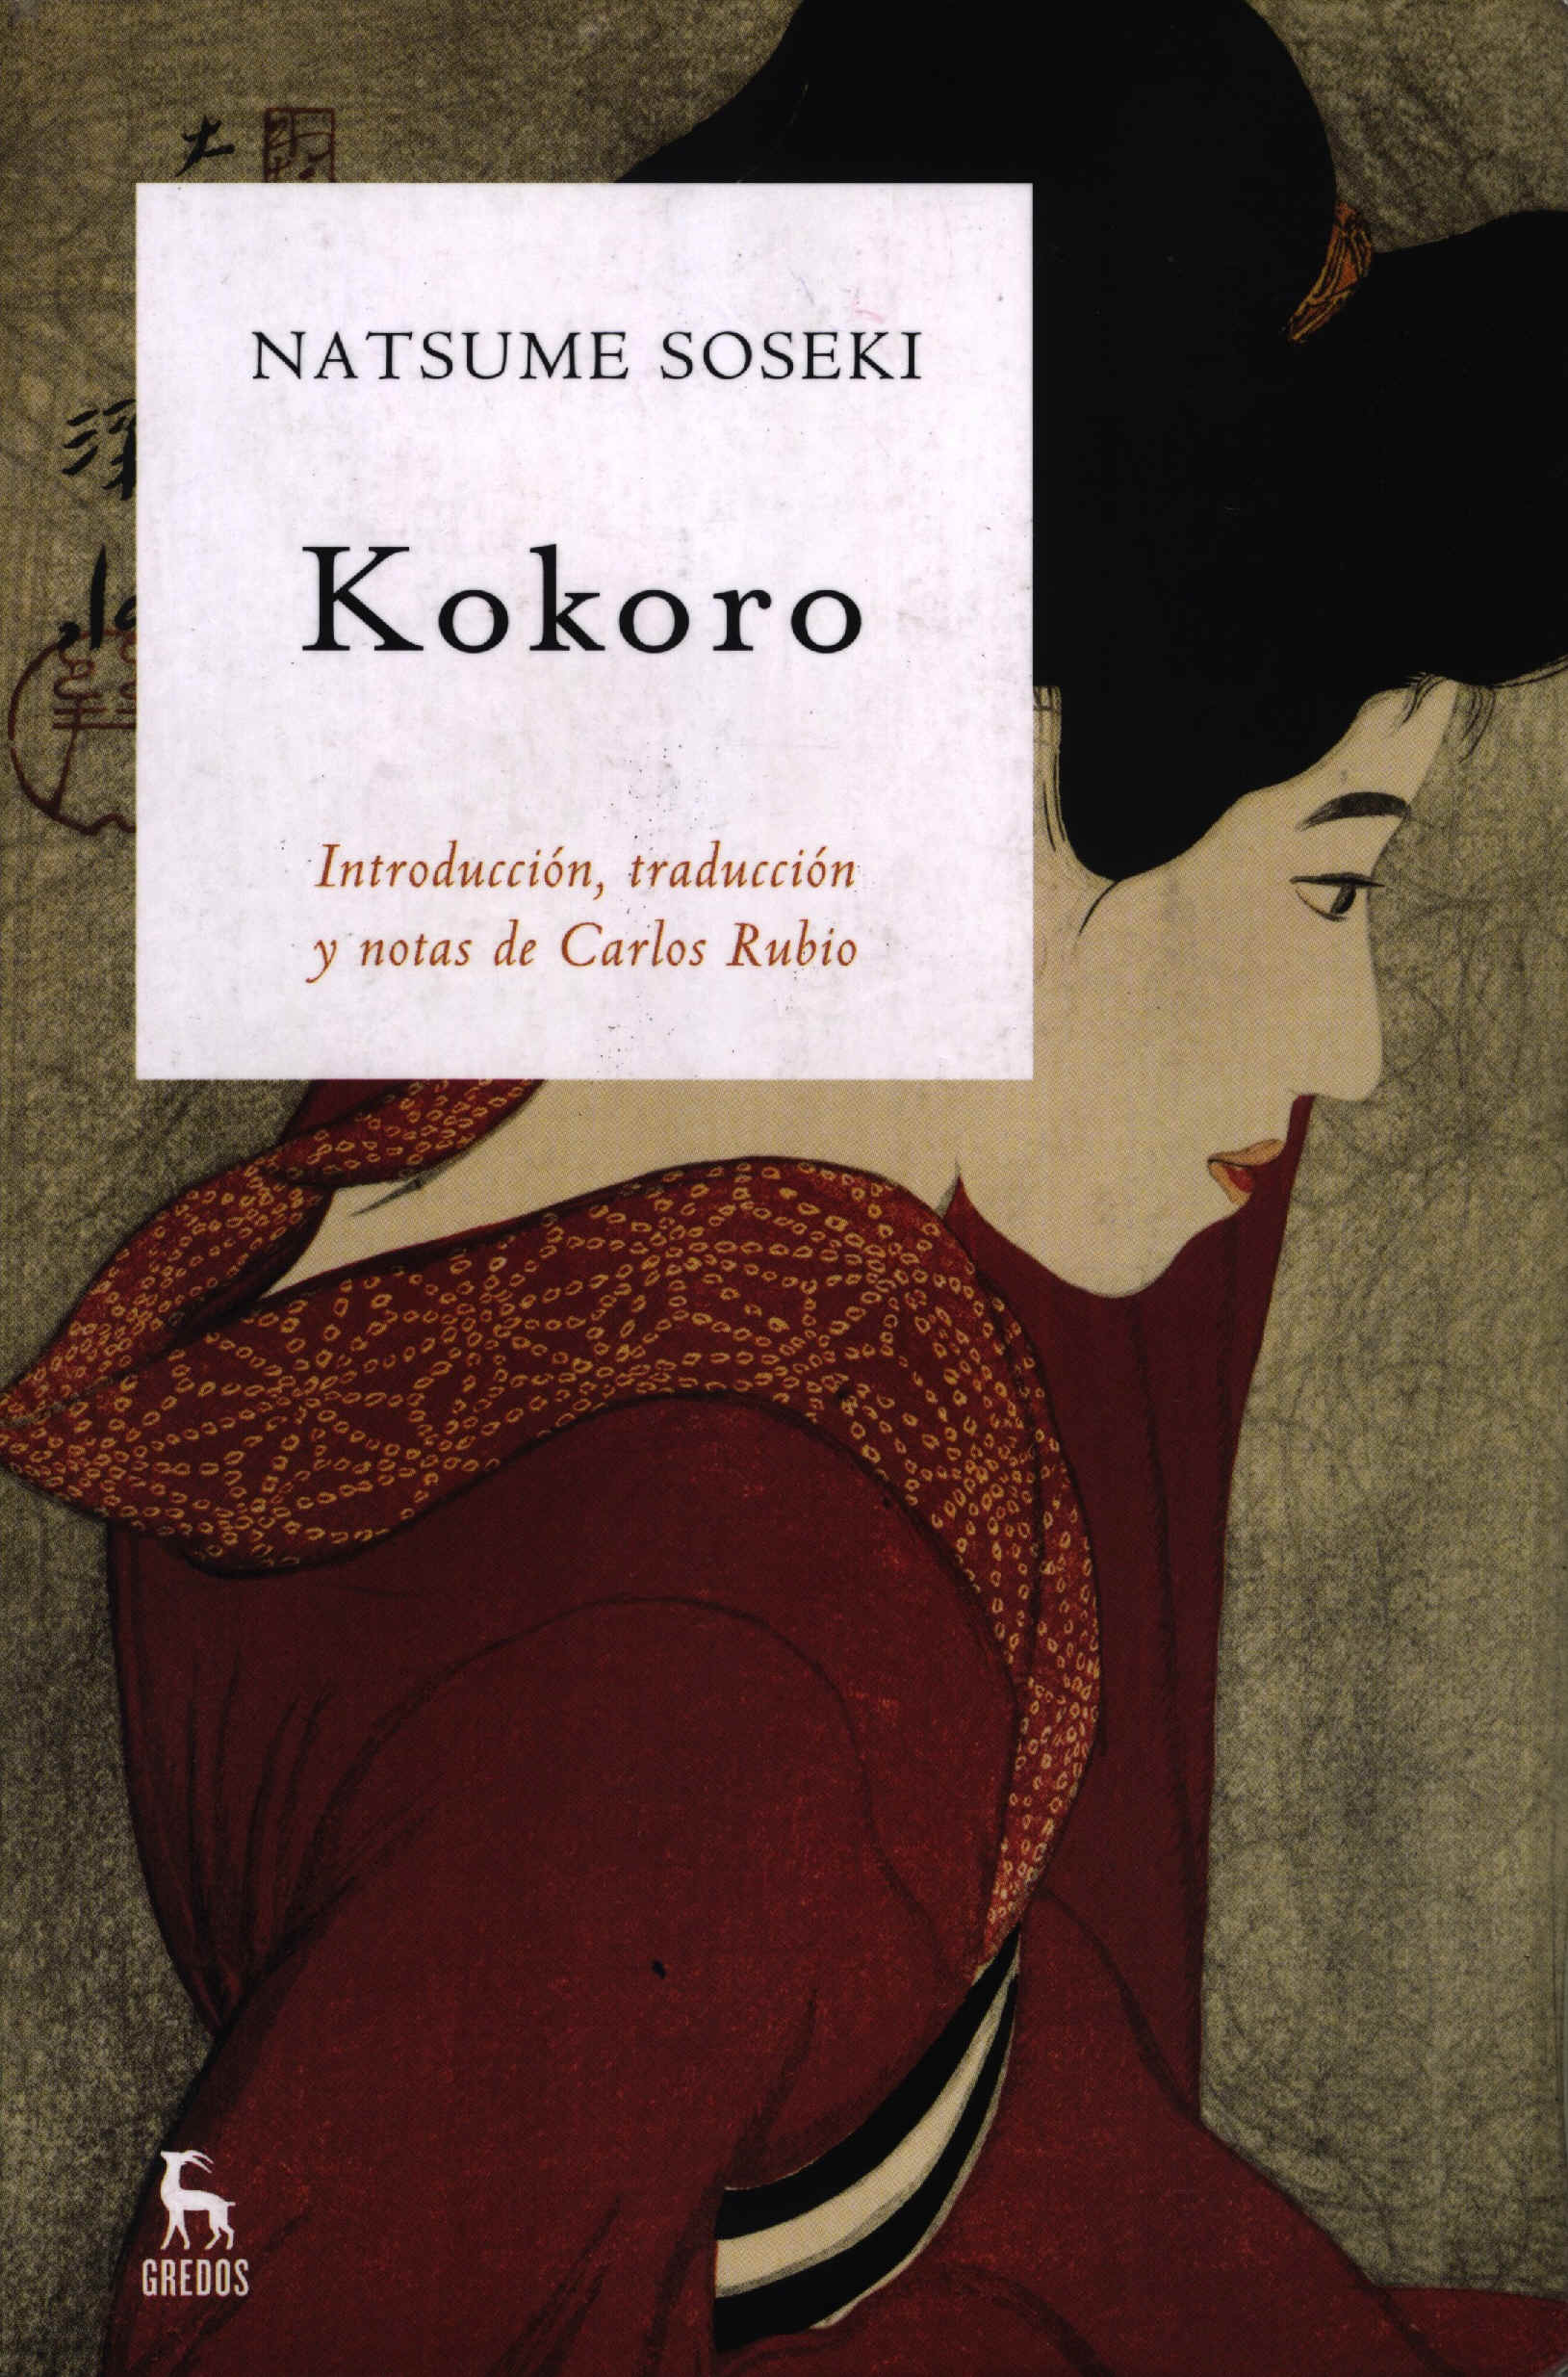 Natsume Soseki kokoro frases